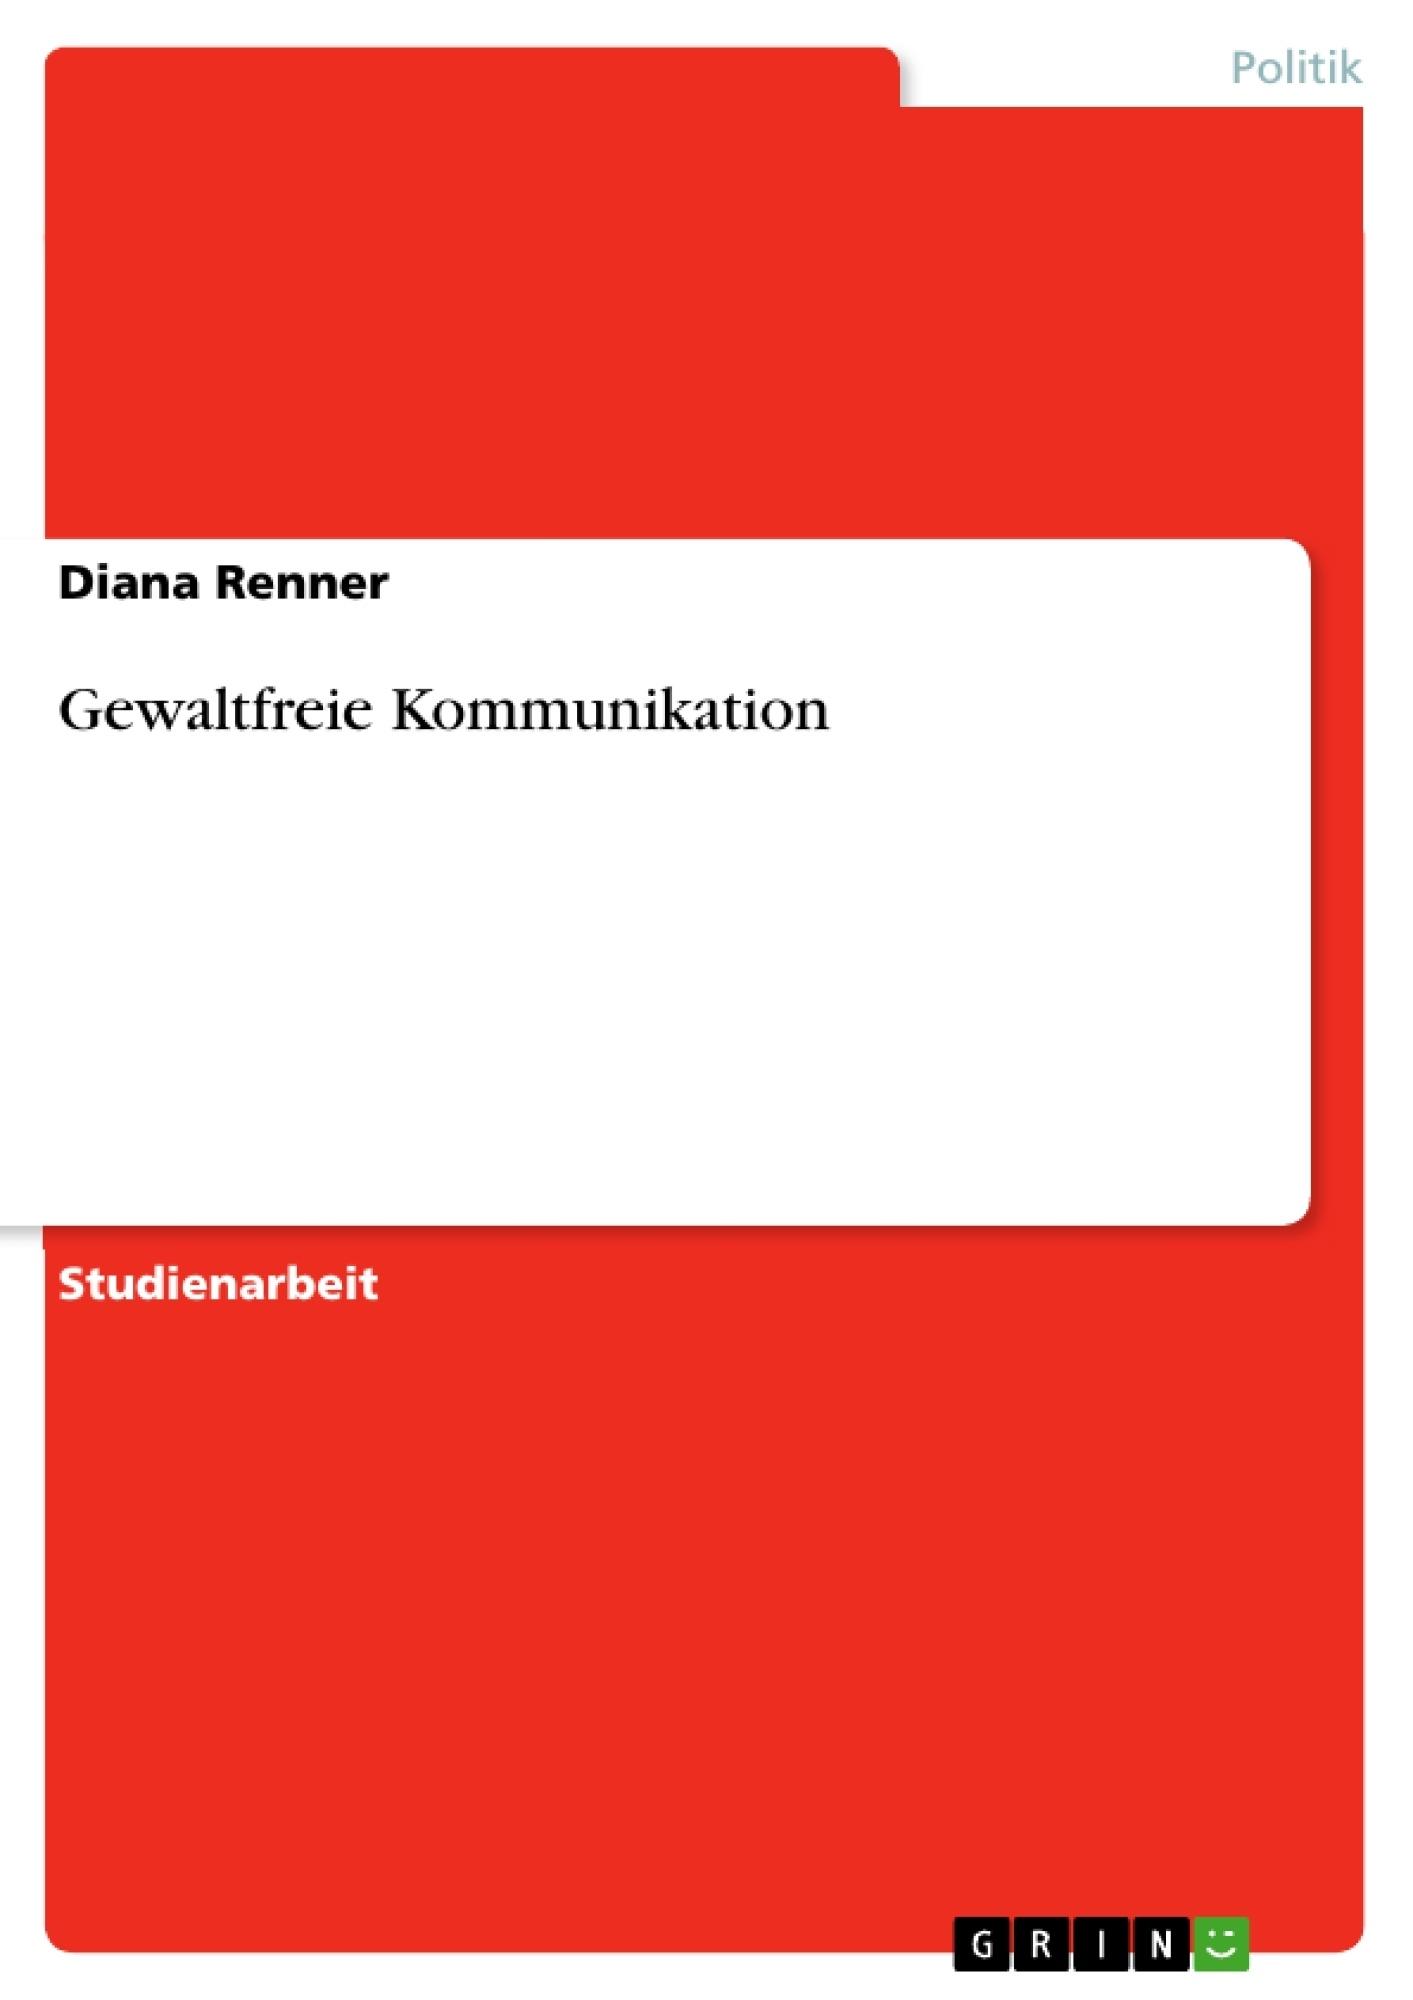 Titel: Gewaltfreie Kommunikation